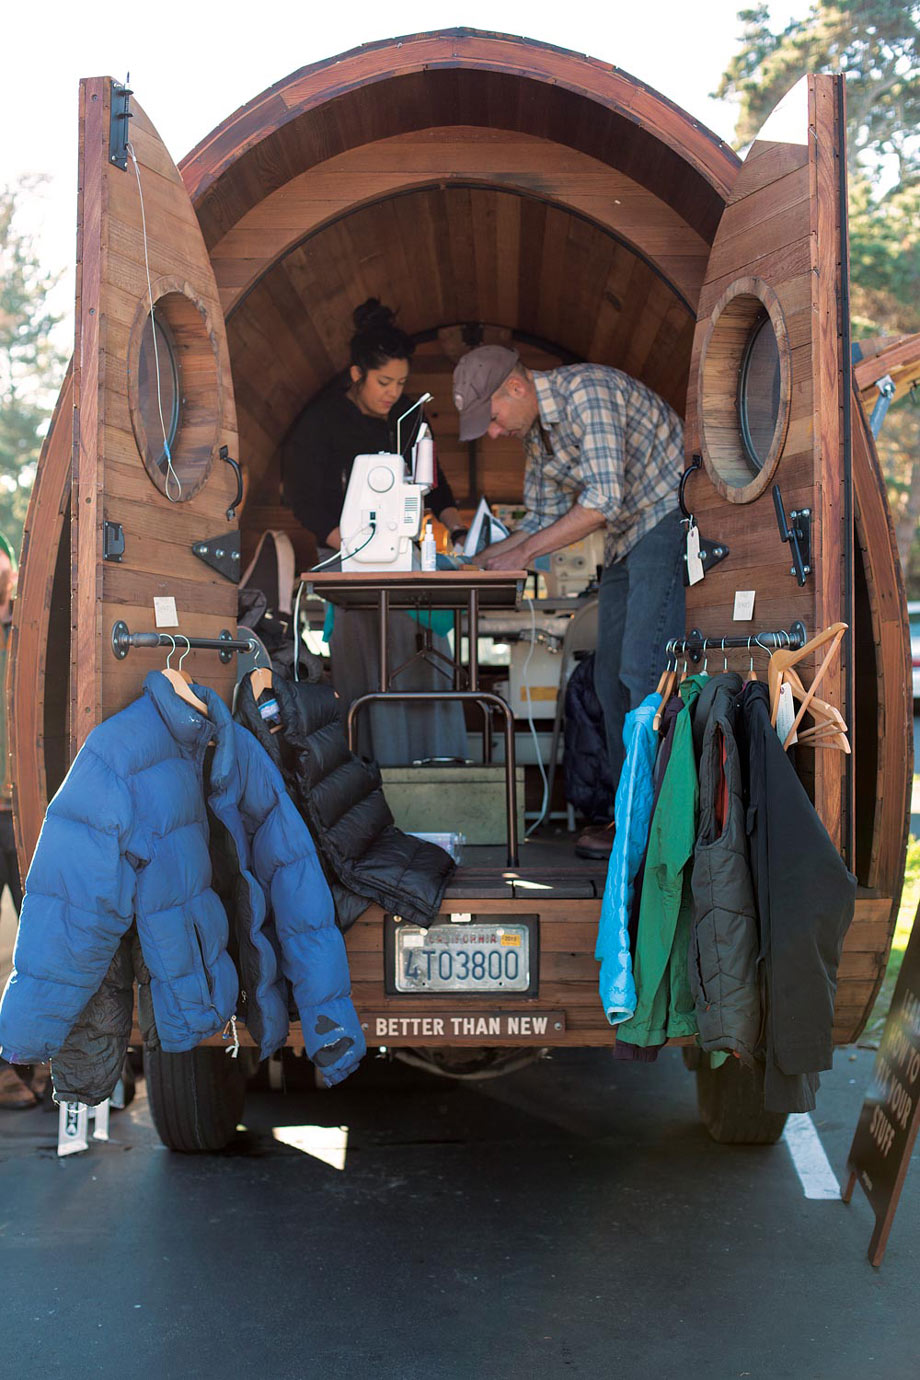 07-Patagonia-worn-wear-truck-jay-nelson-design